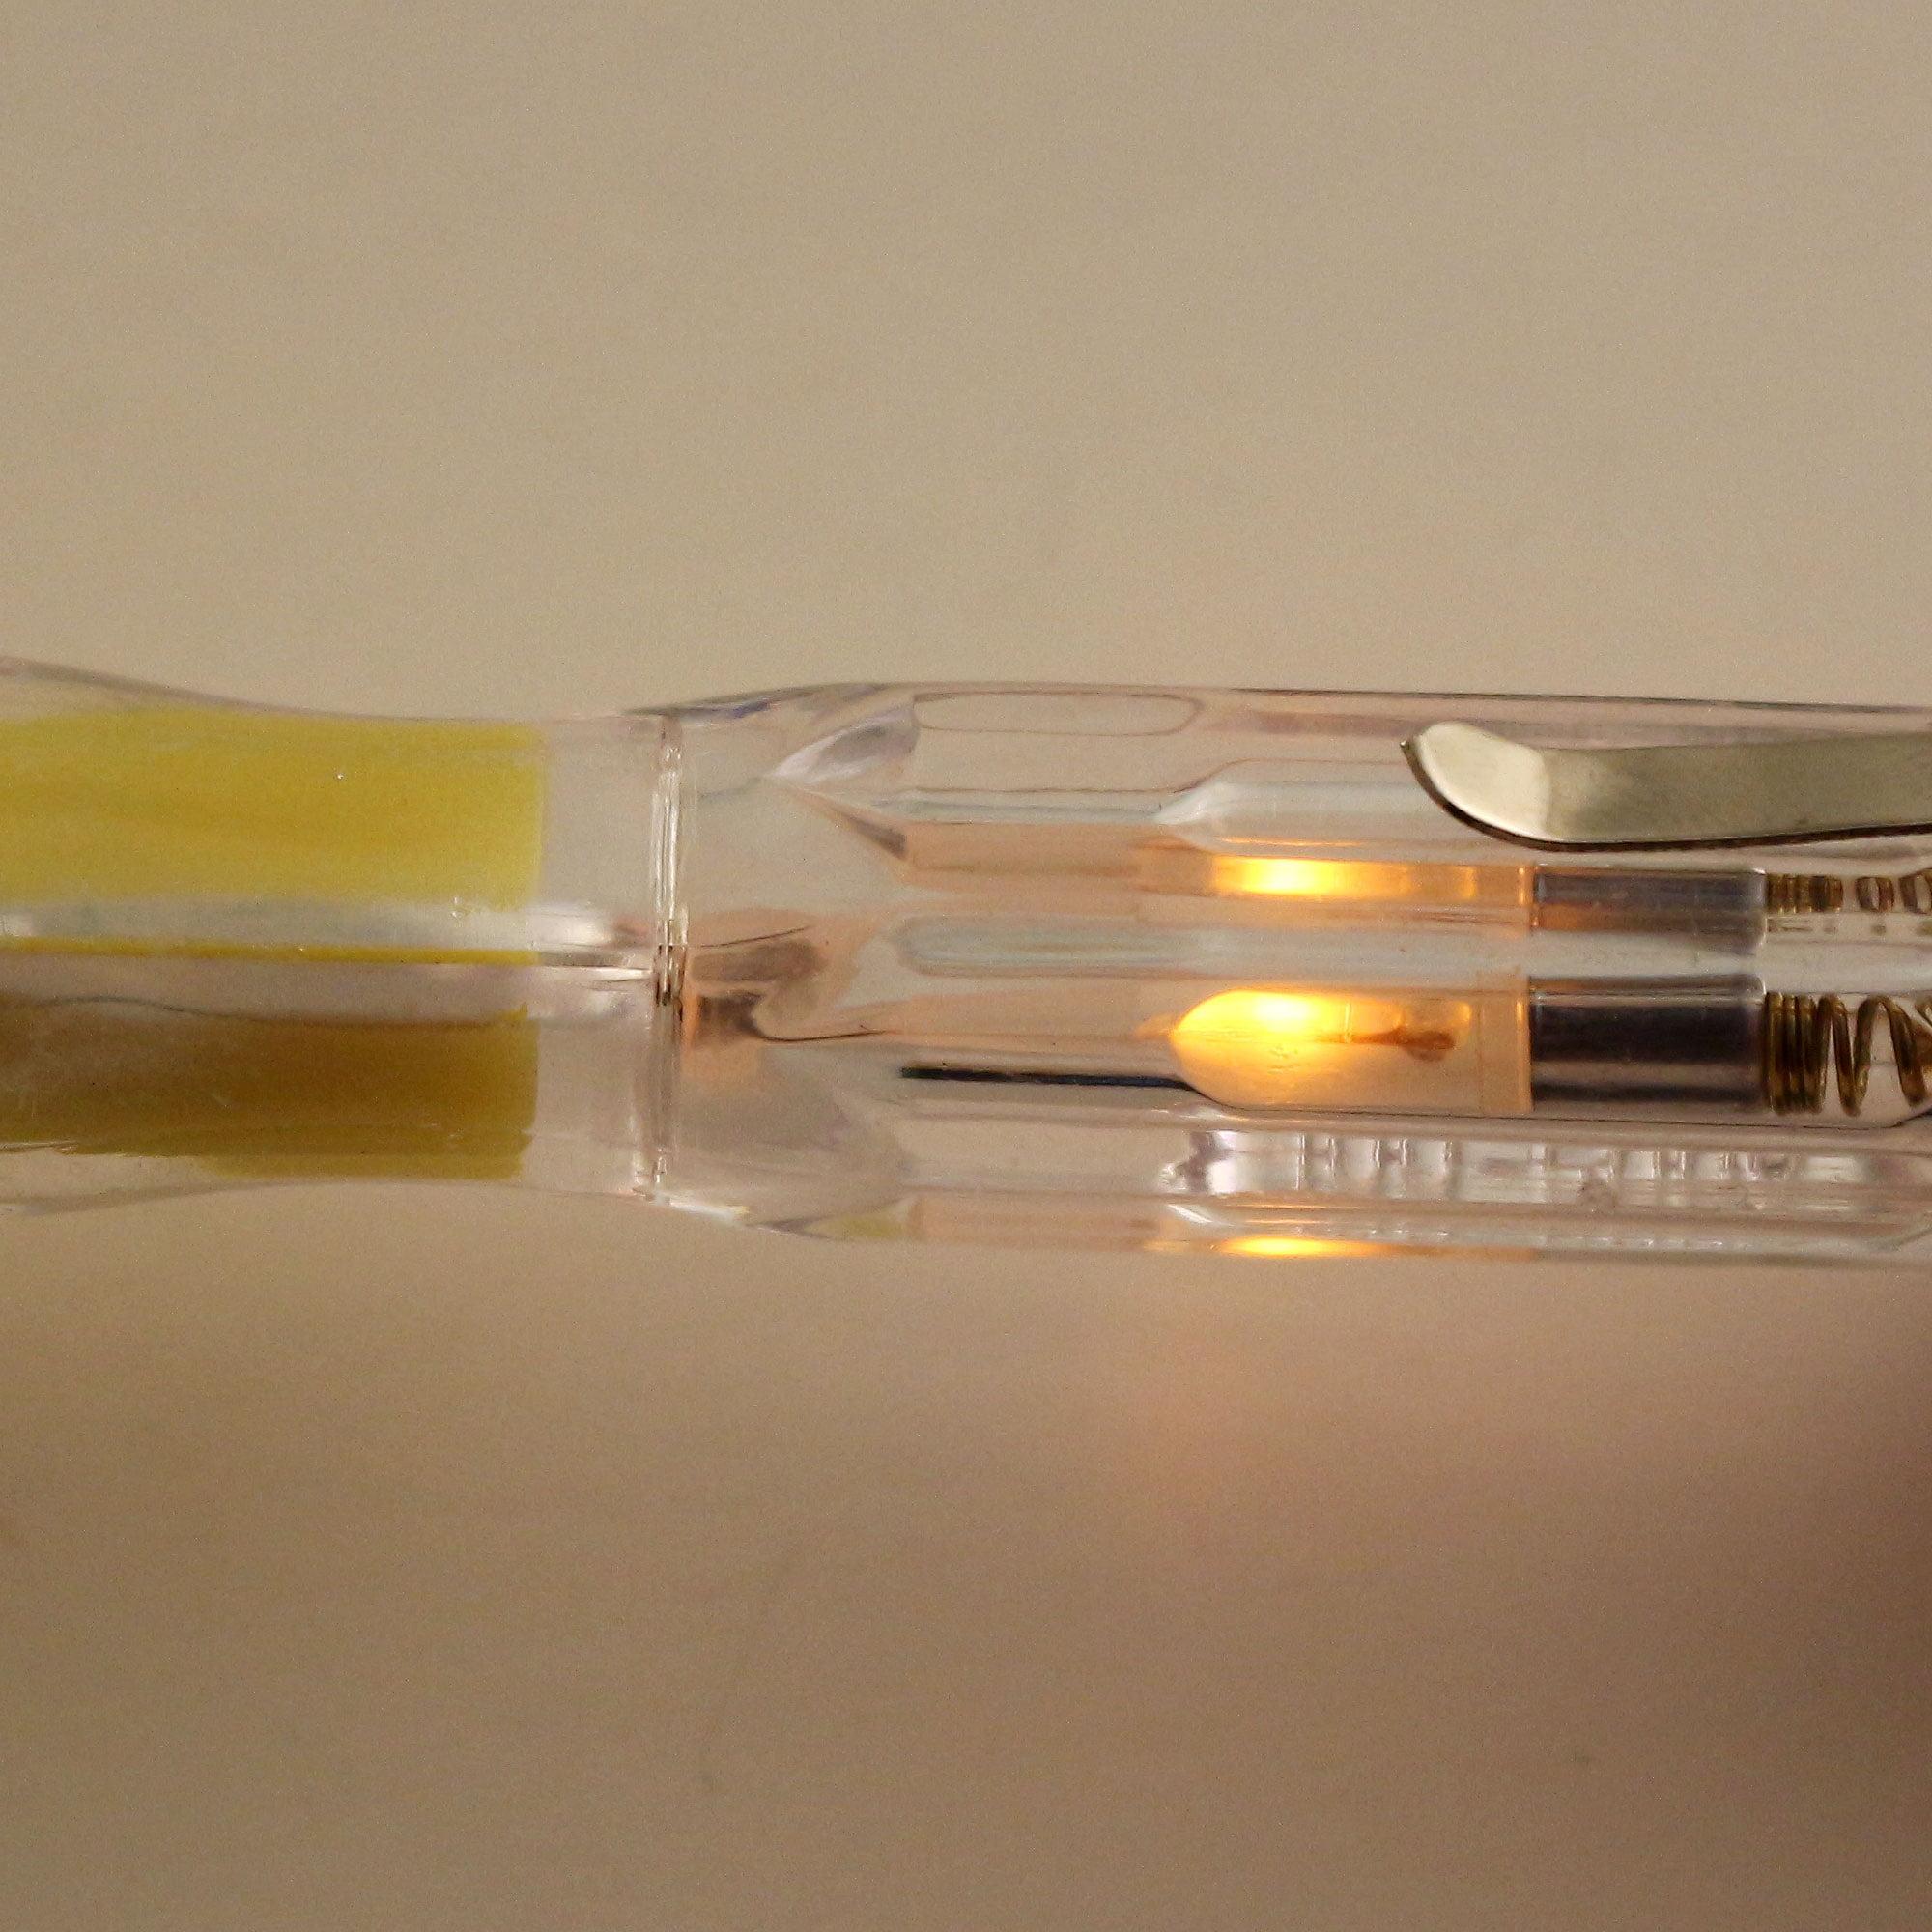 Voltage Tester, 100-500V Electrical Test Pen, 3.5mm Double Head Slot Philips Screwdriver Circuit Detector Neon Tube 5pcs - image 4 de 5